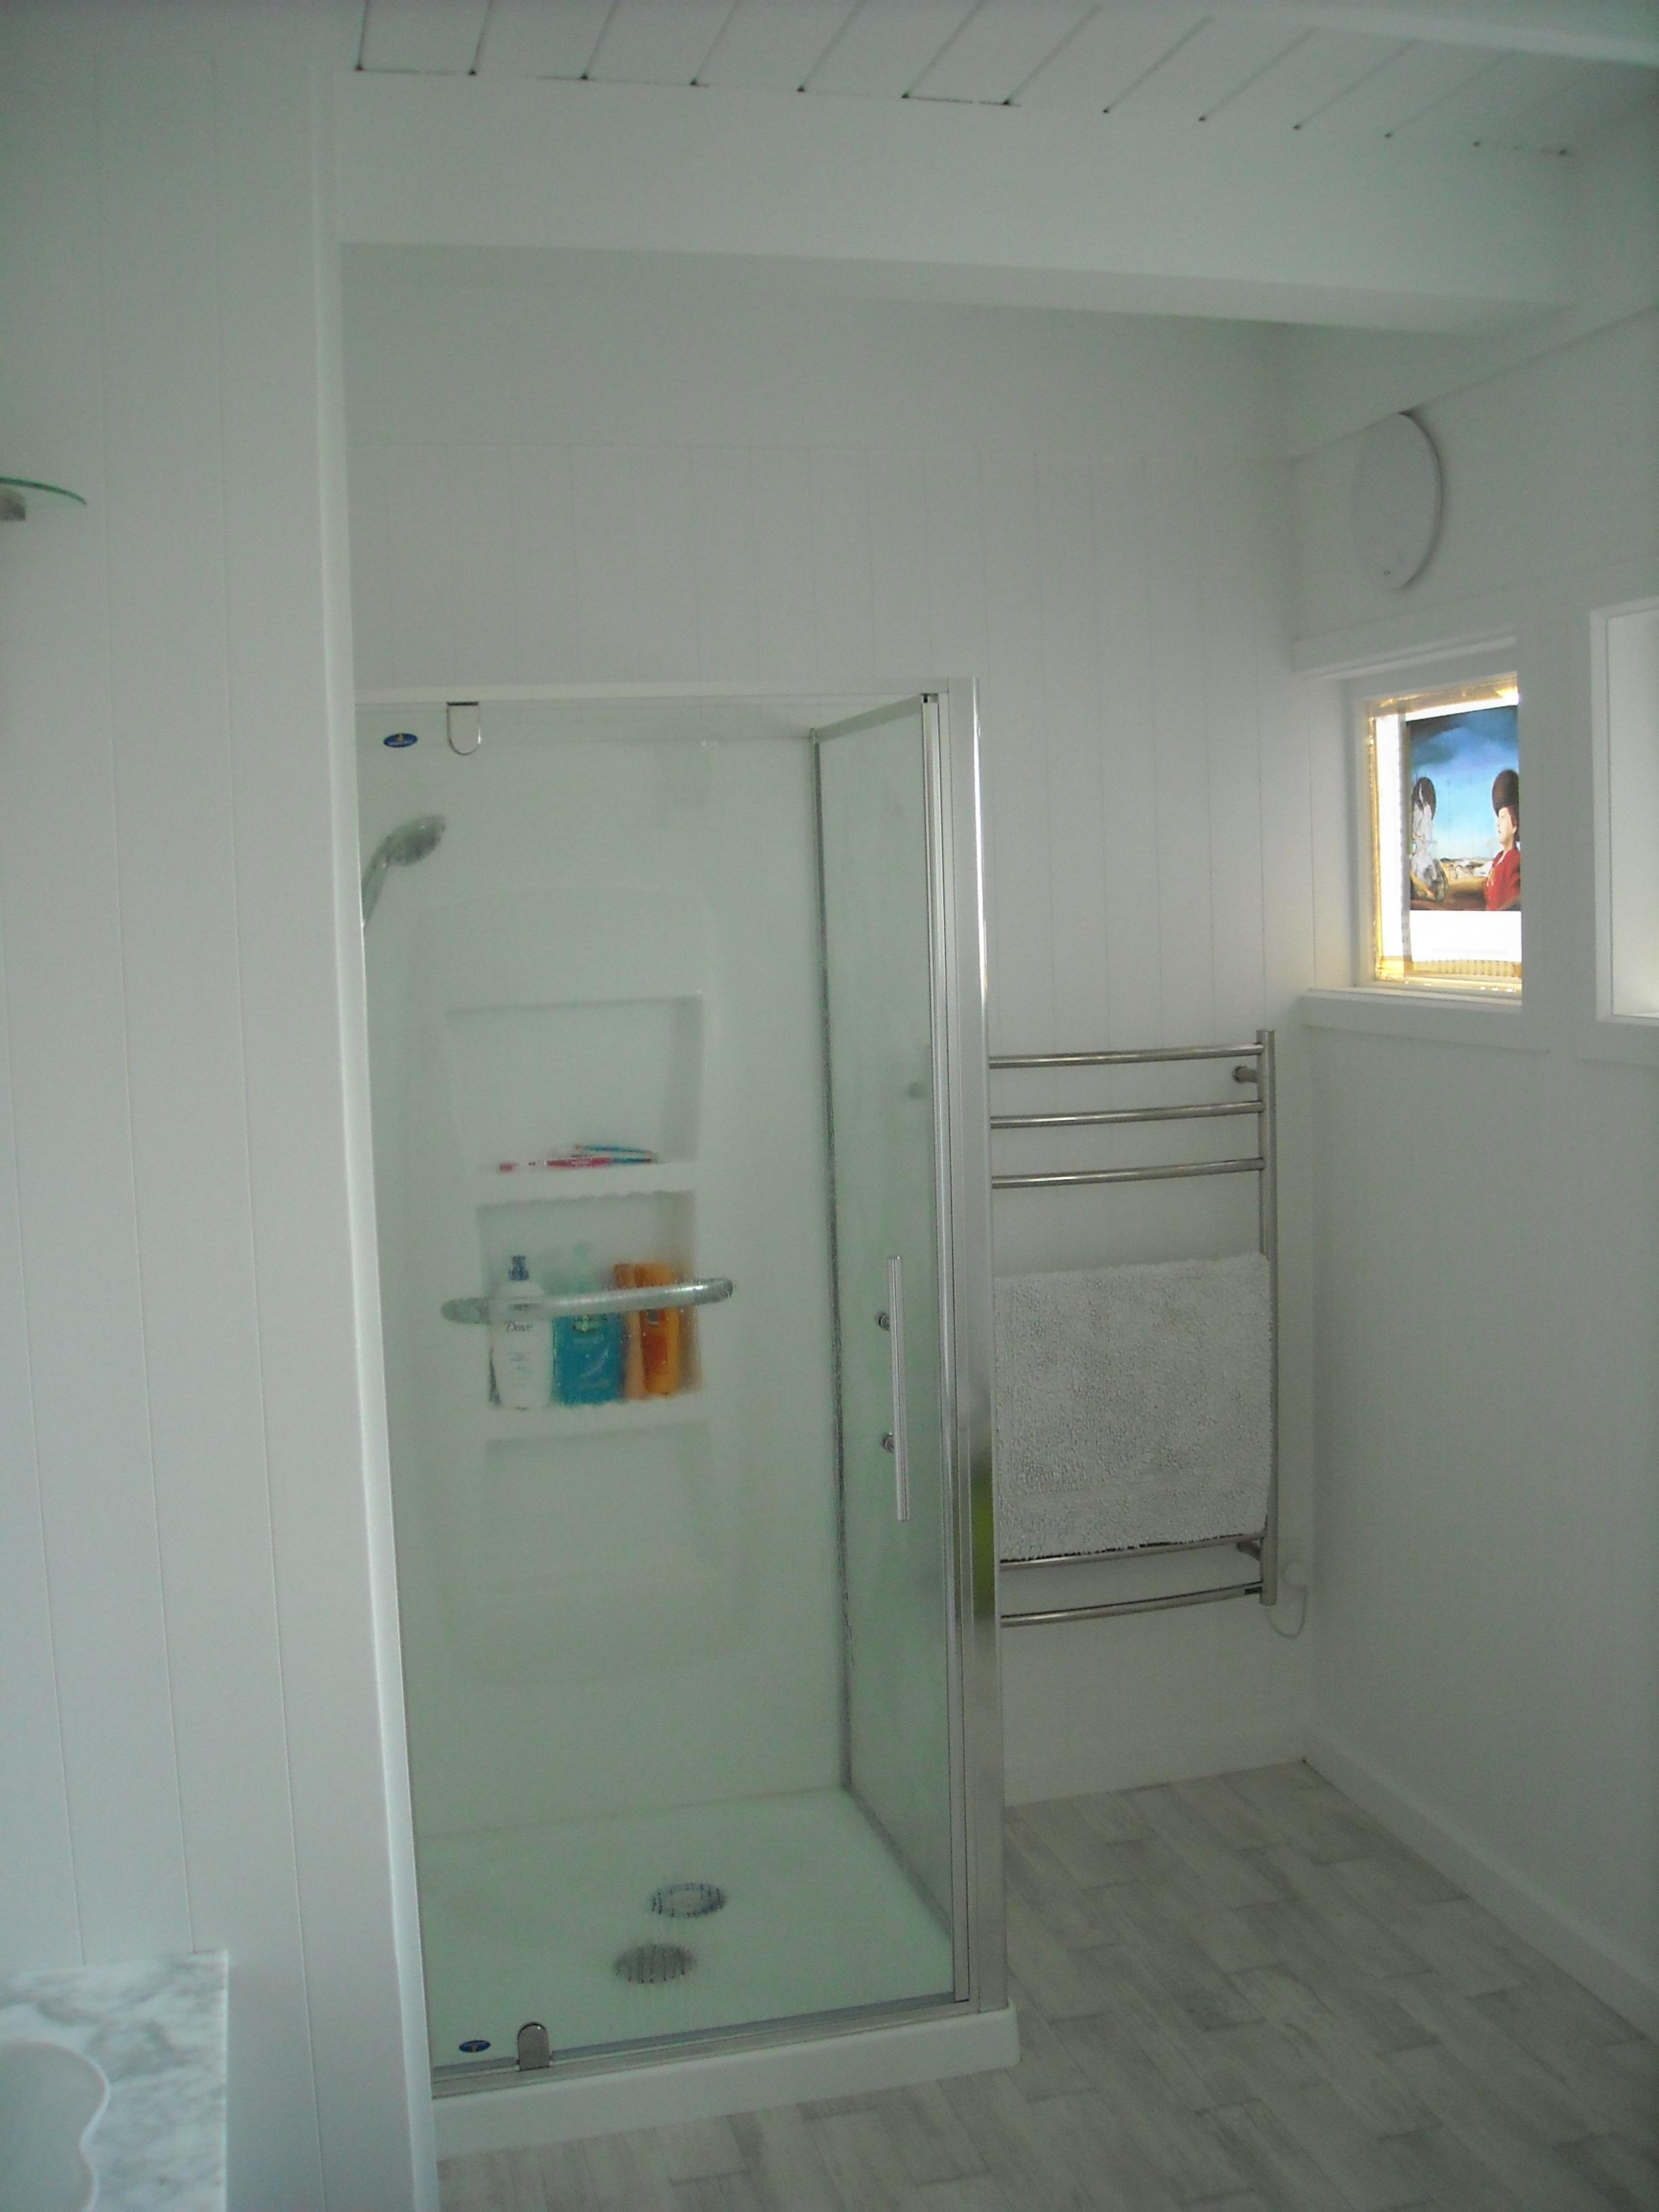 Shower pict window 007.JPG